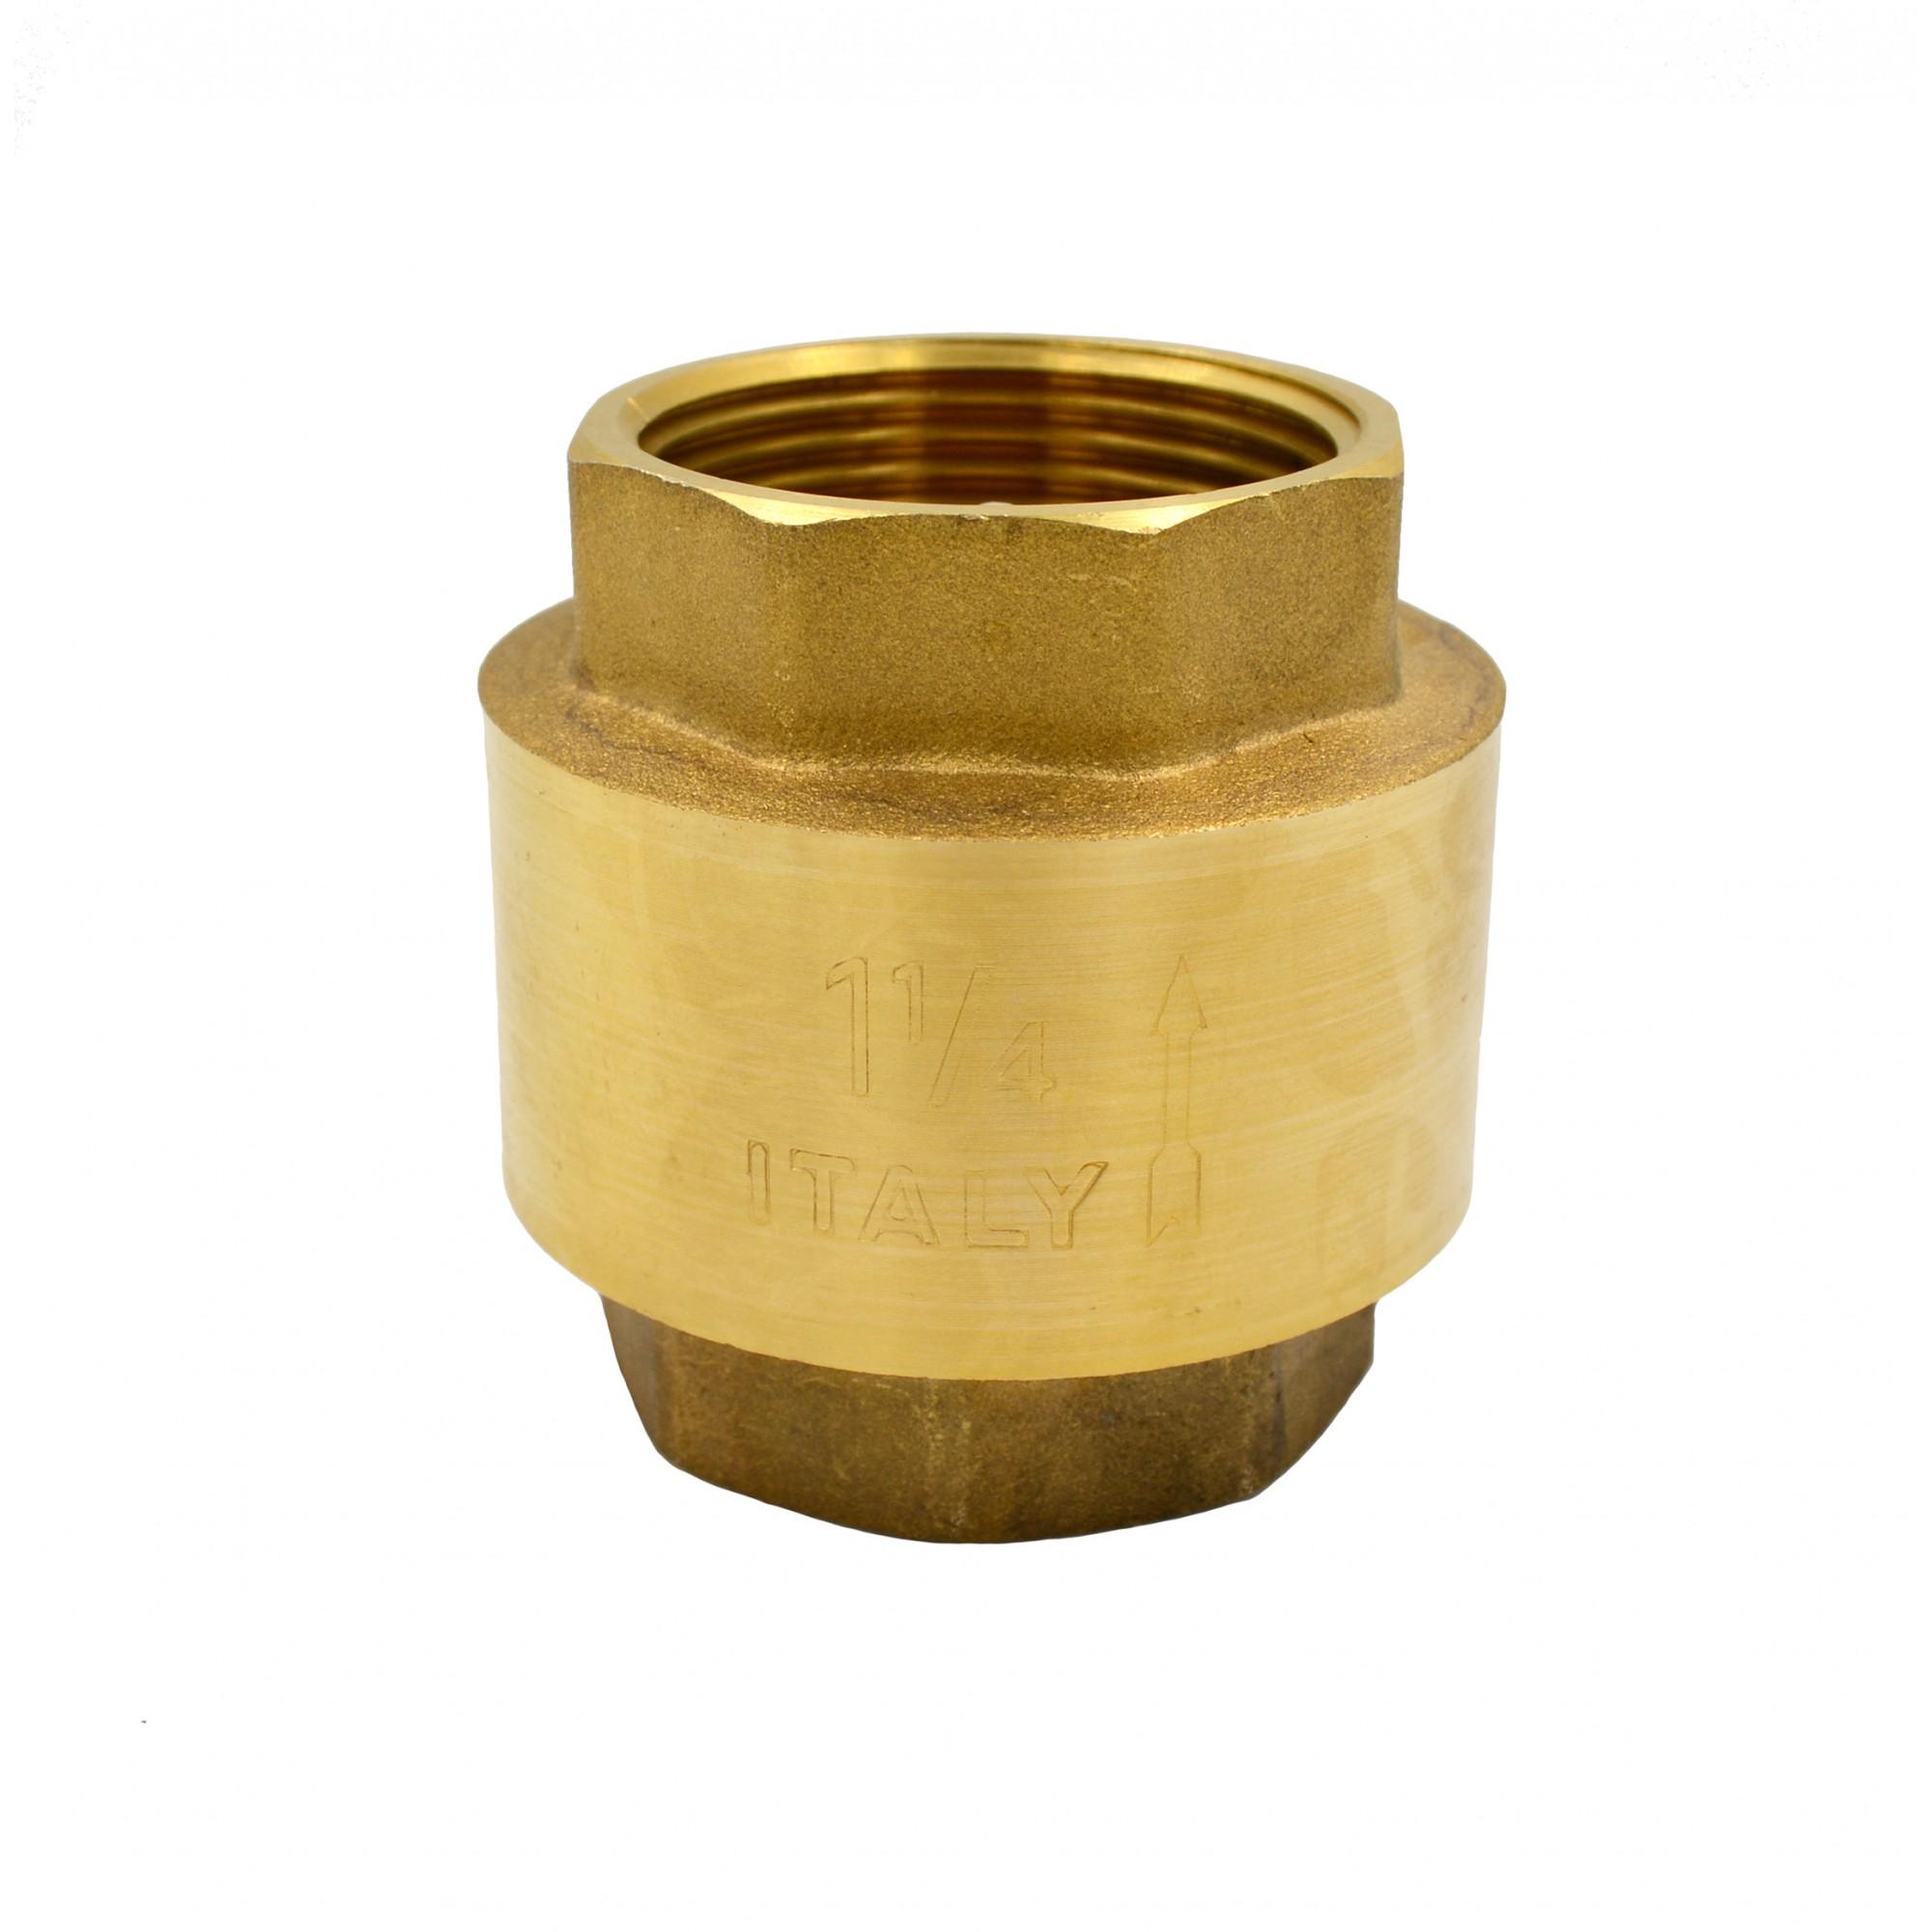 "Обратный клапан 1""1/4 J.G. пластиковый шток J.G."